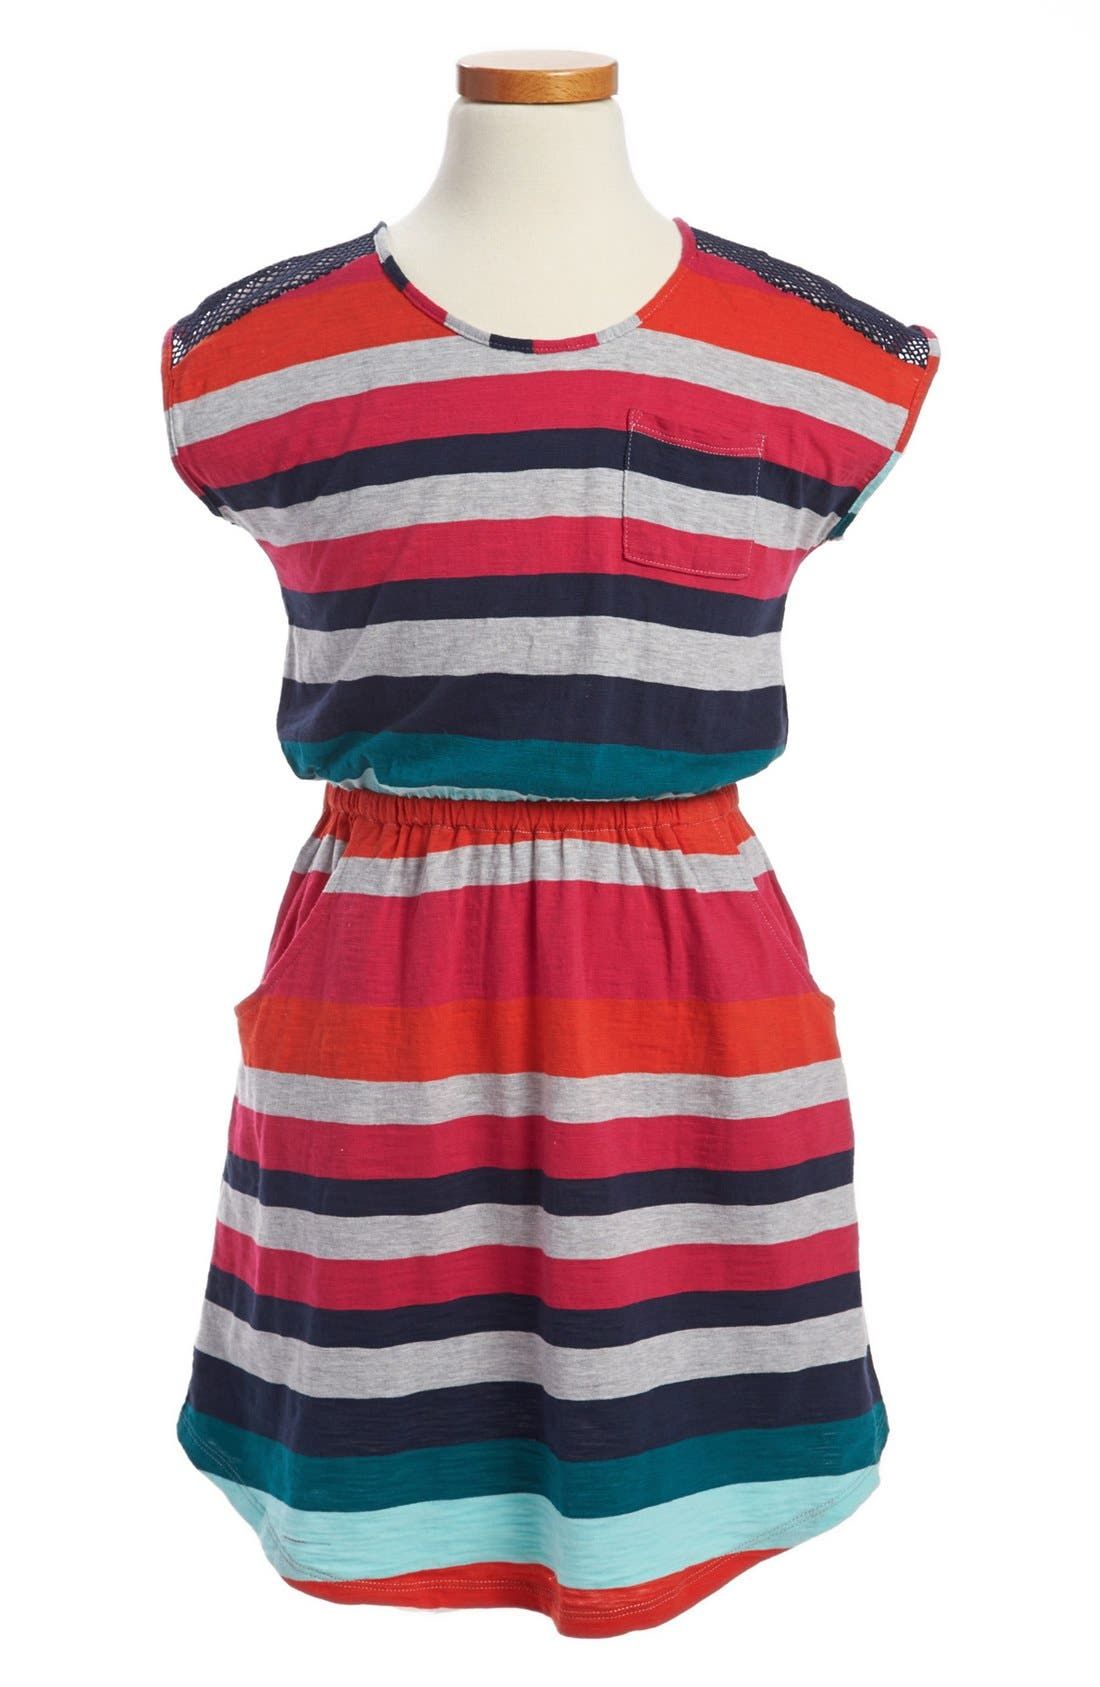 Alternate Image 1 Selected - Roxy 'First Glance' Knit Dress (Big Girls)